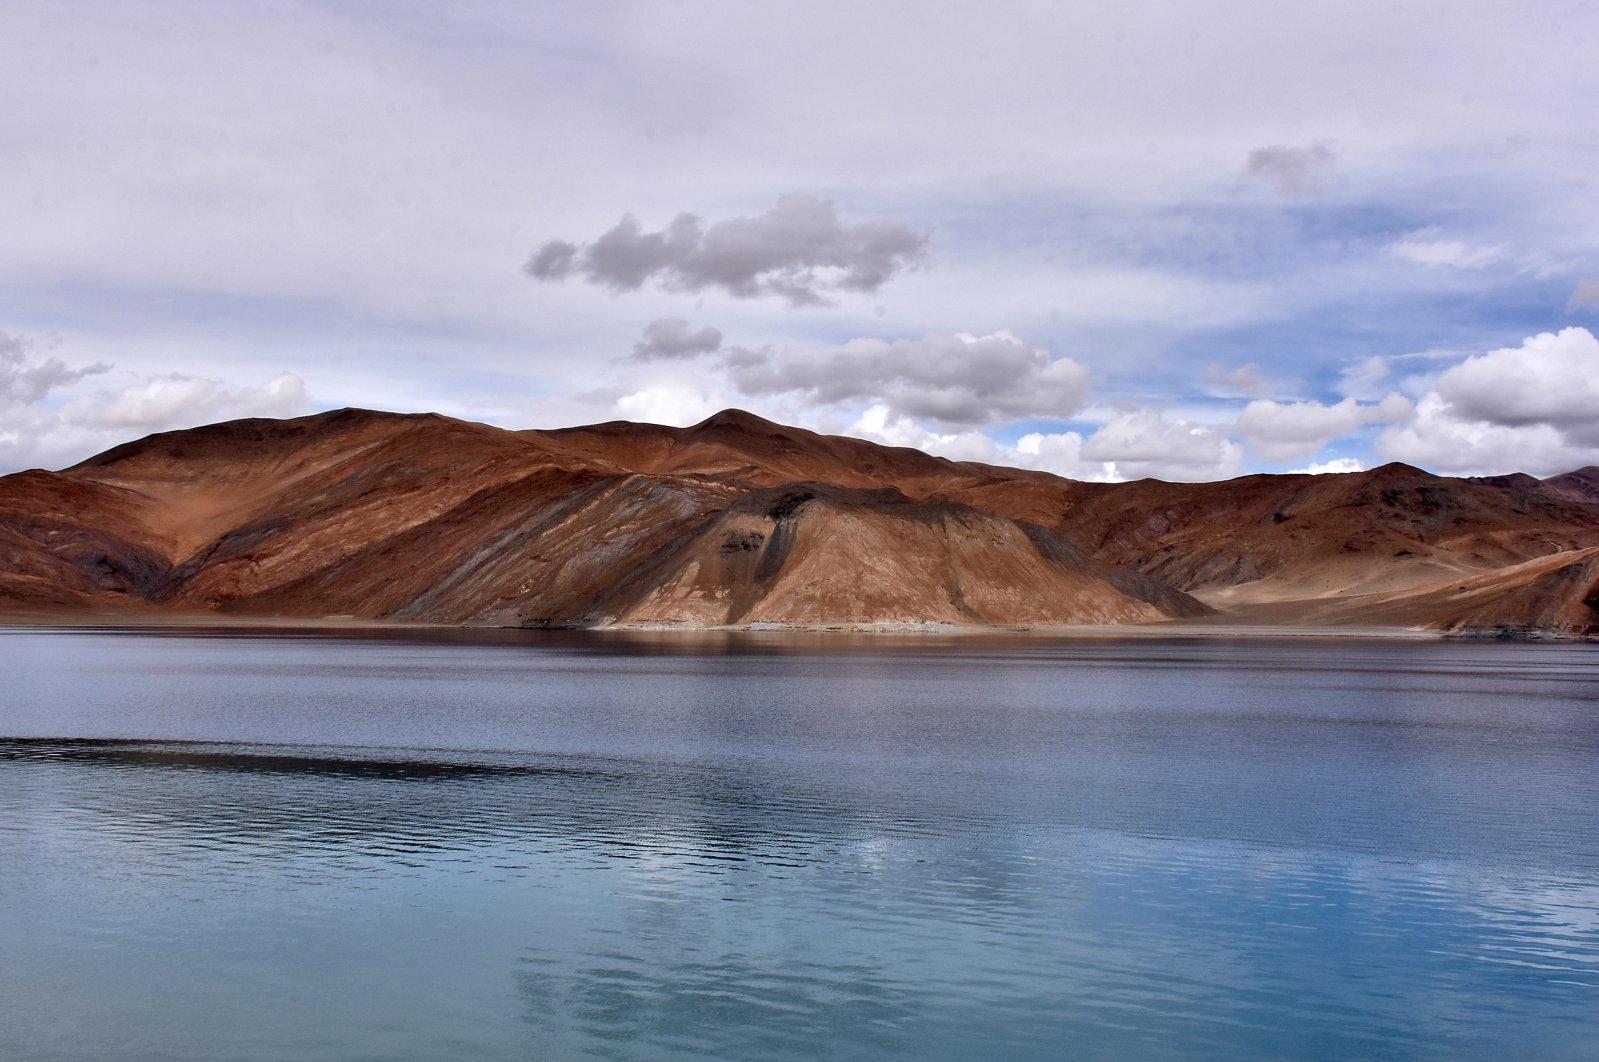 A view of Pangong Tso lake in Ladakh region July 27, 2019. (Reuters Photo)